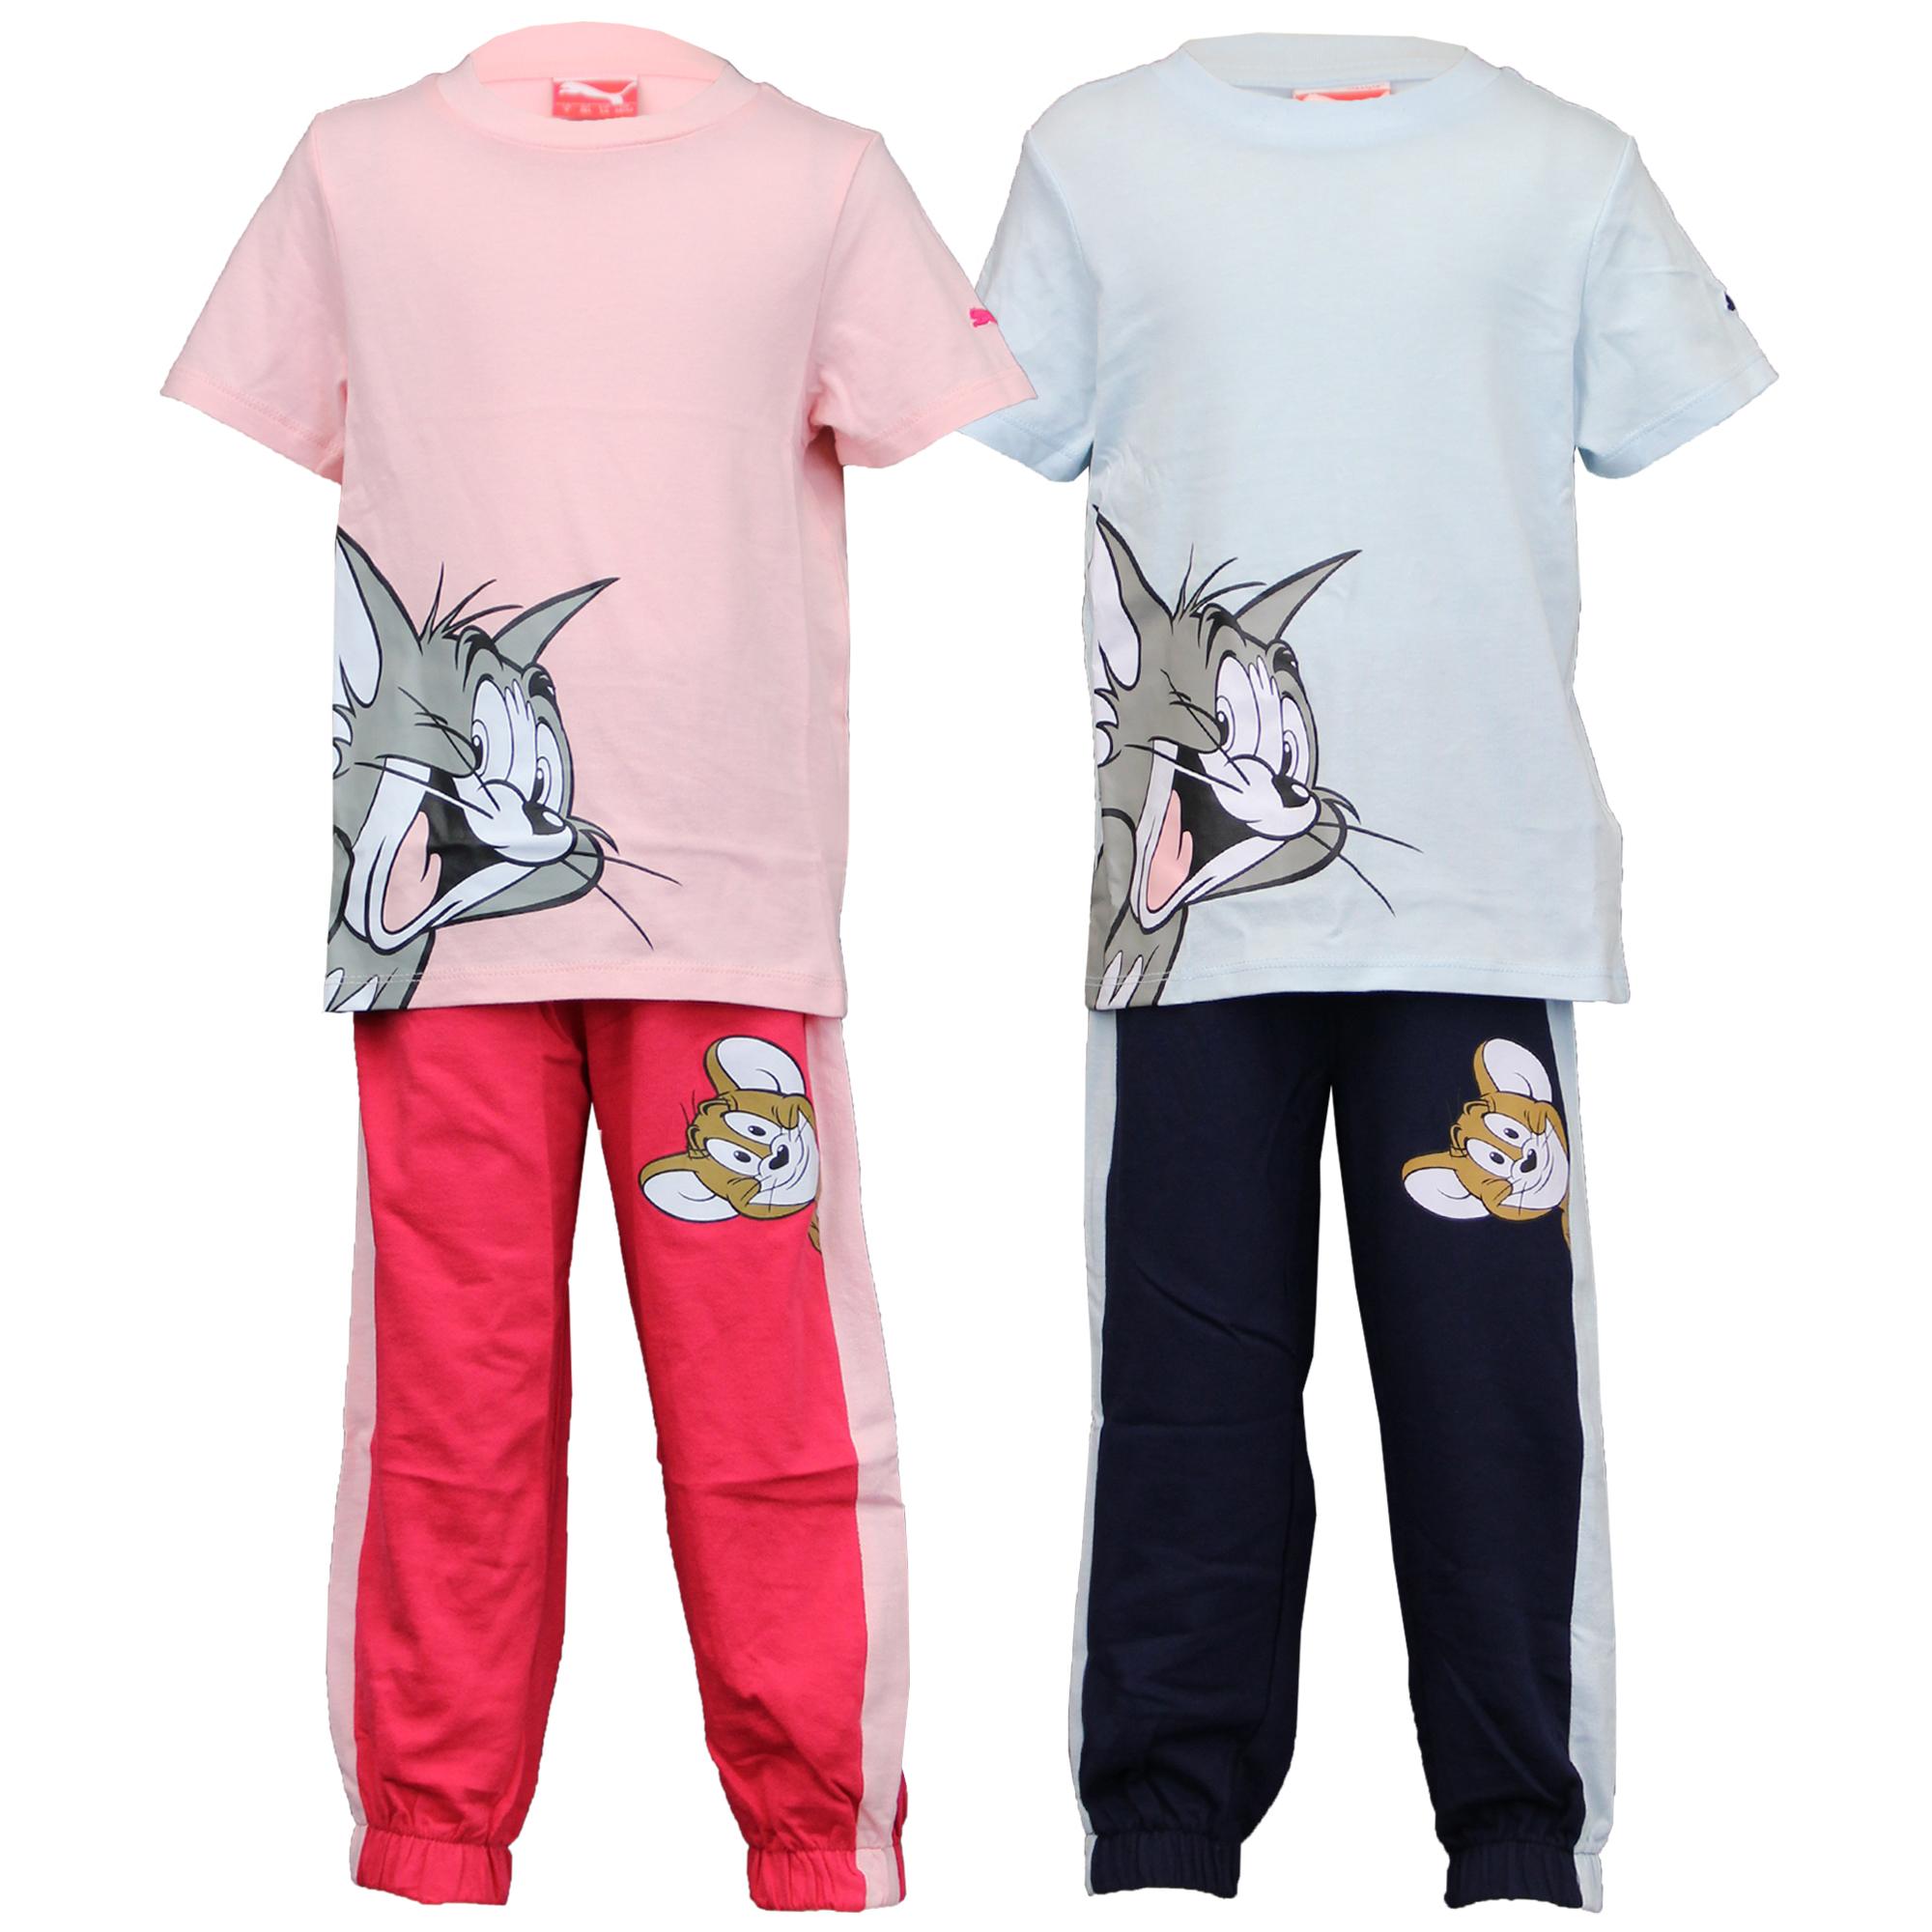 Boys Girls Set PUMA Kids Pyjama Tom & Jerry Cartoon T Shirt Bottom